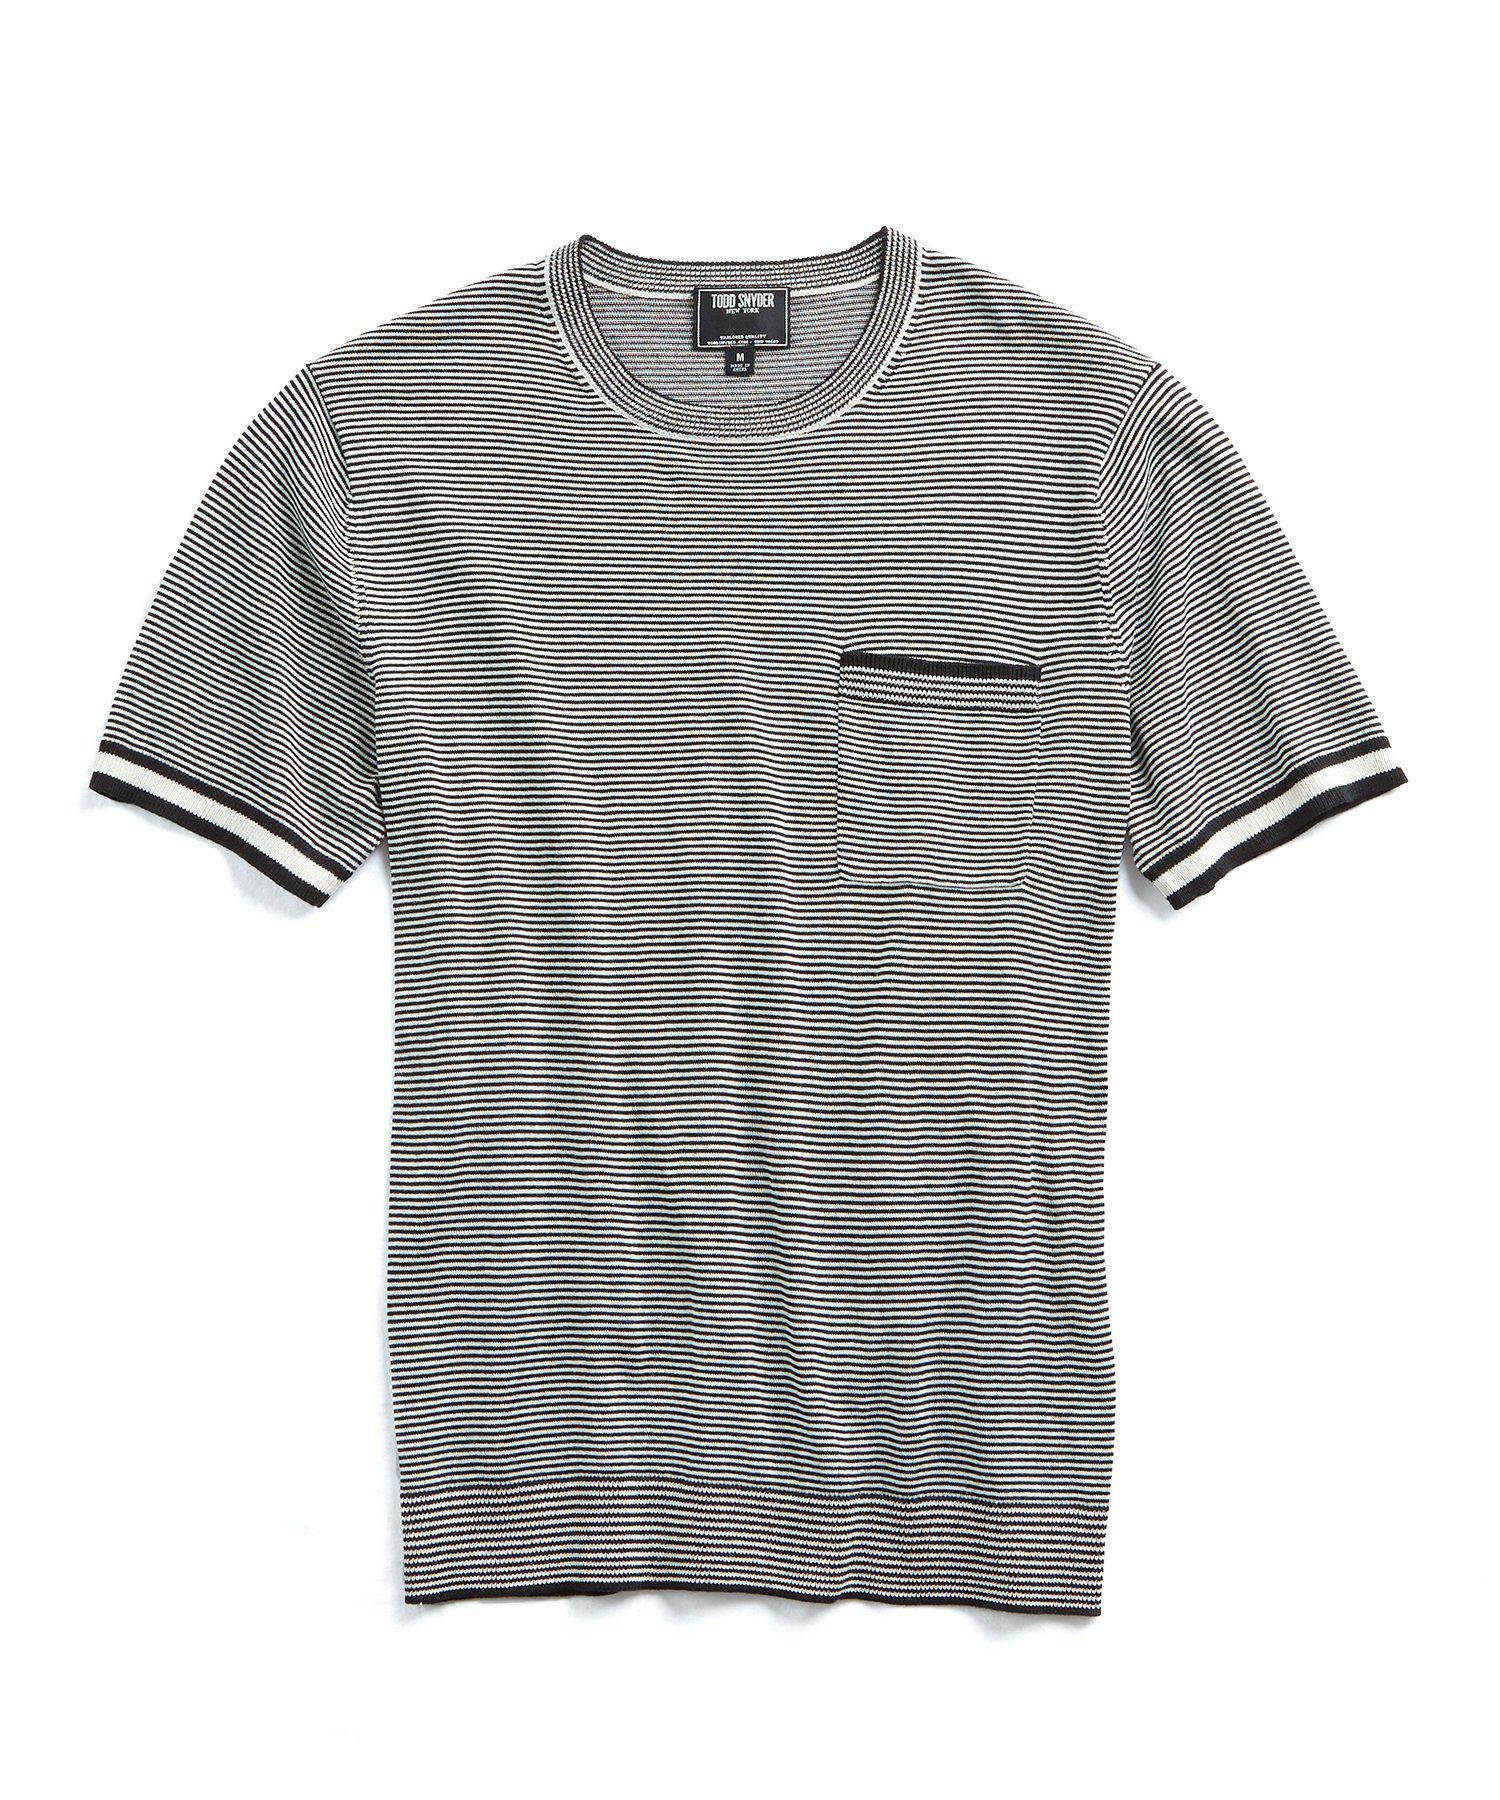 66e17d80 Todd Snyder Italian Silk/cotton Feeder Stripe Short Sleeve Knit ...